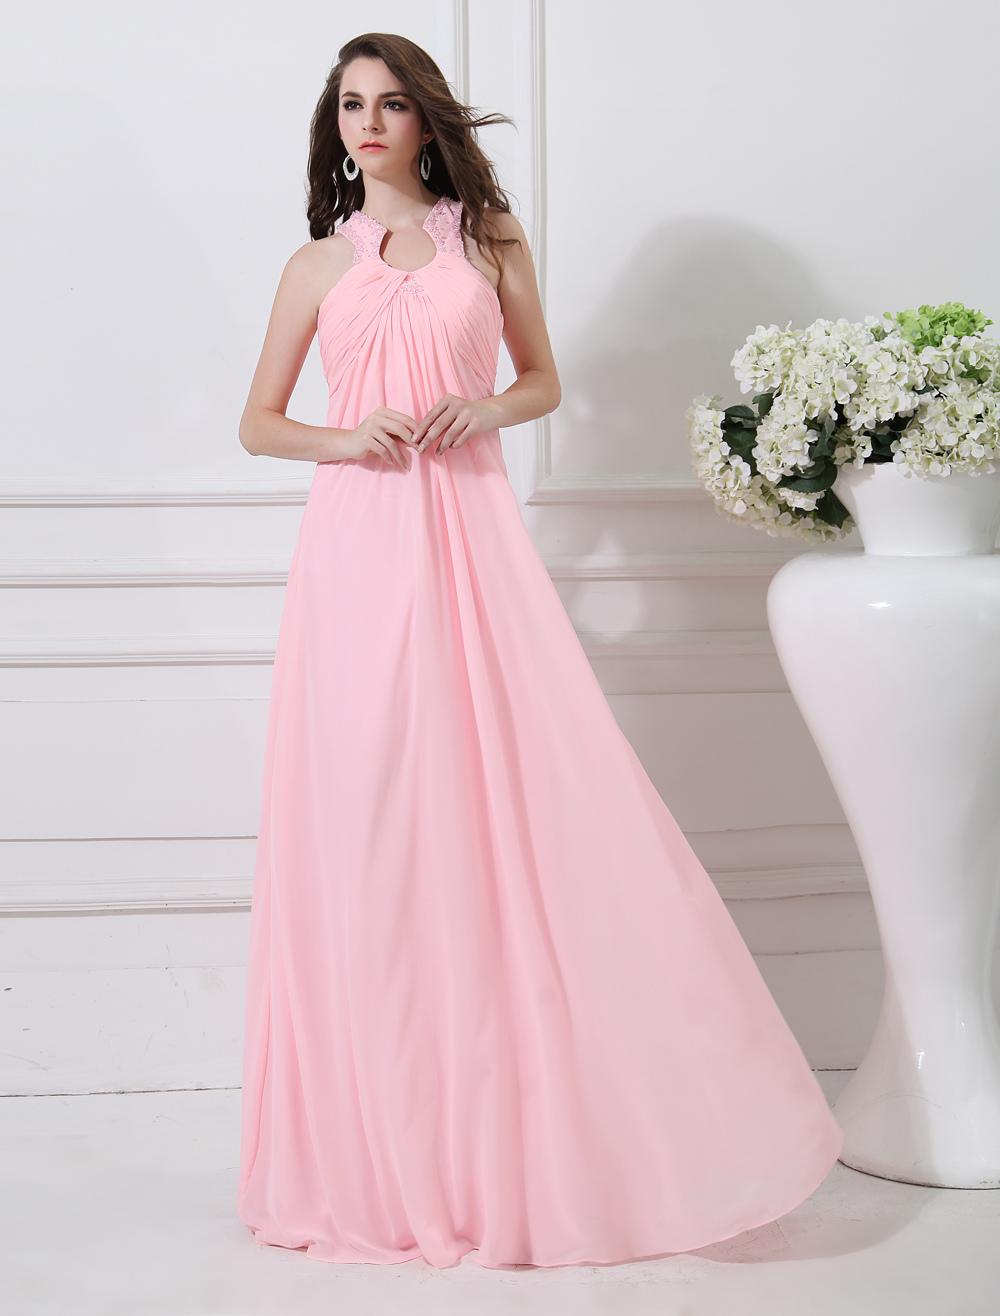 Grace Pink Keyhole Neck Pleated Sheath Chiffon Evening Dress (Wedding Evening Dresses) photo